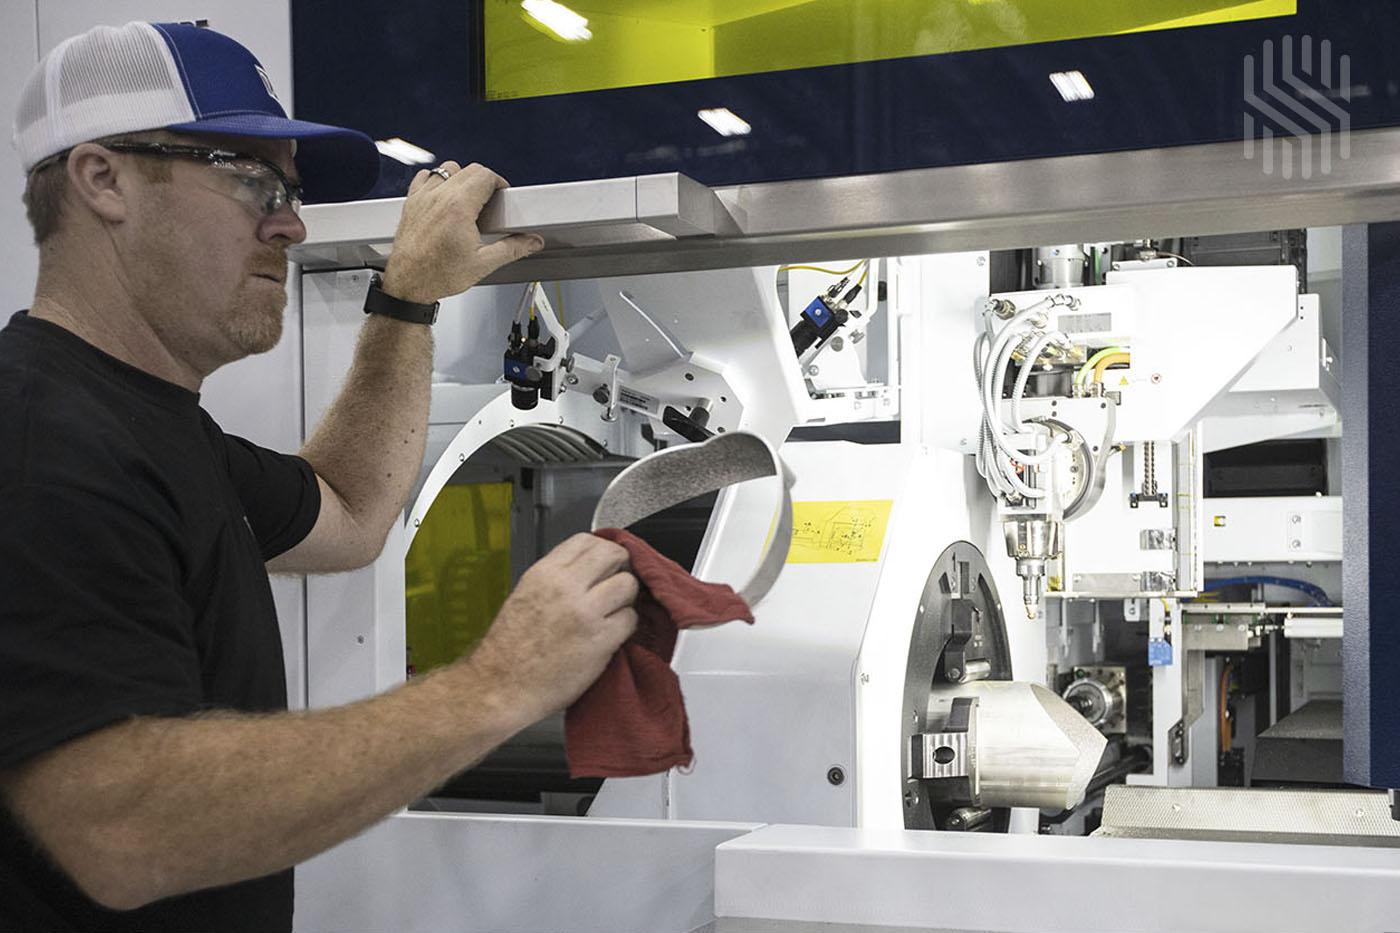 Laser Cutting in Metal Fabrication